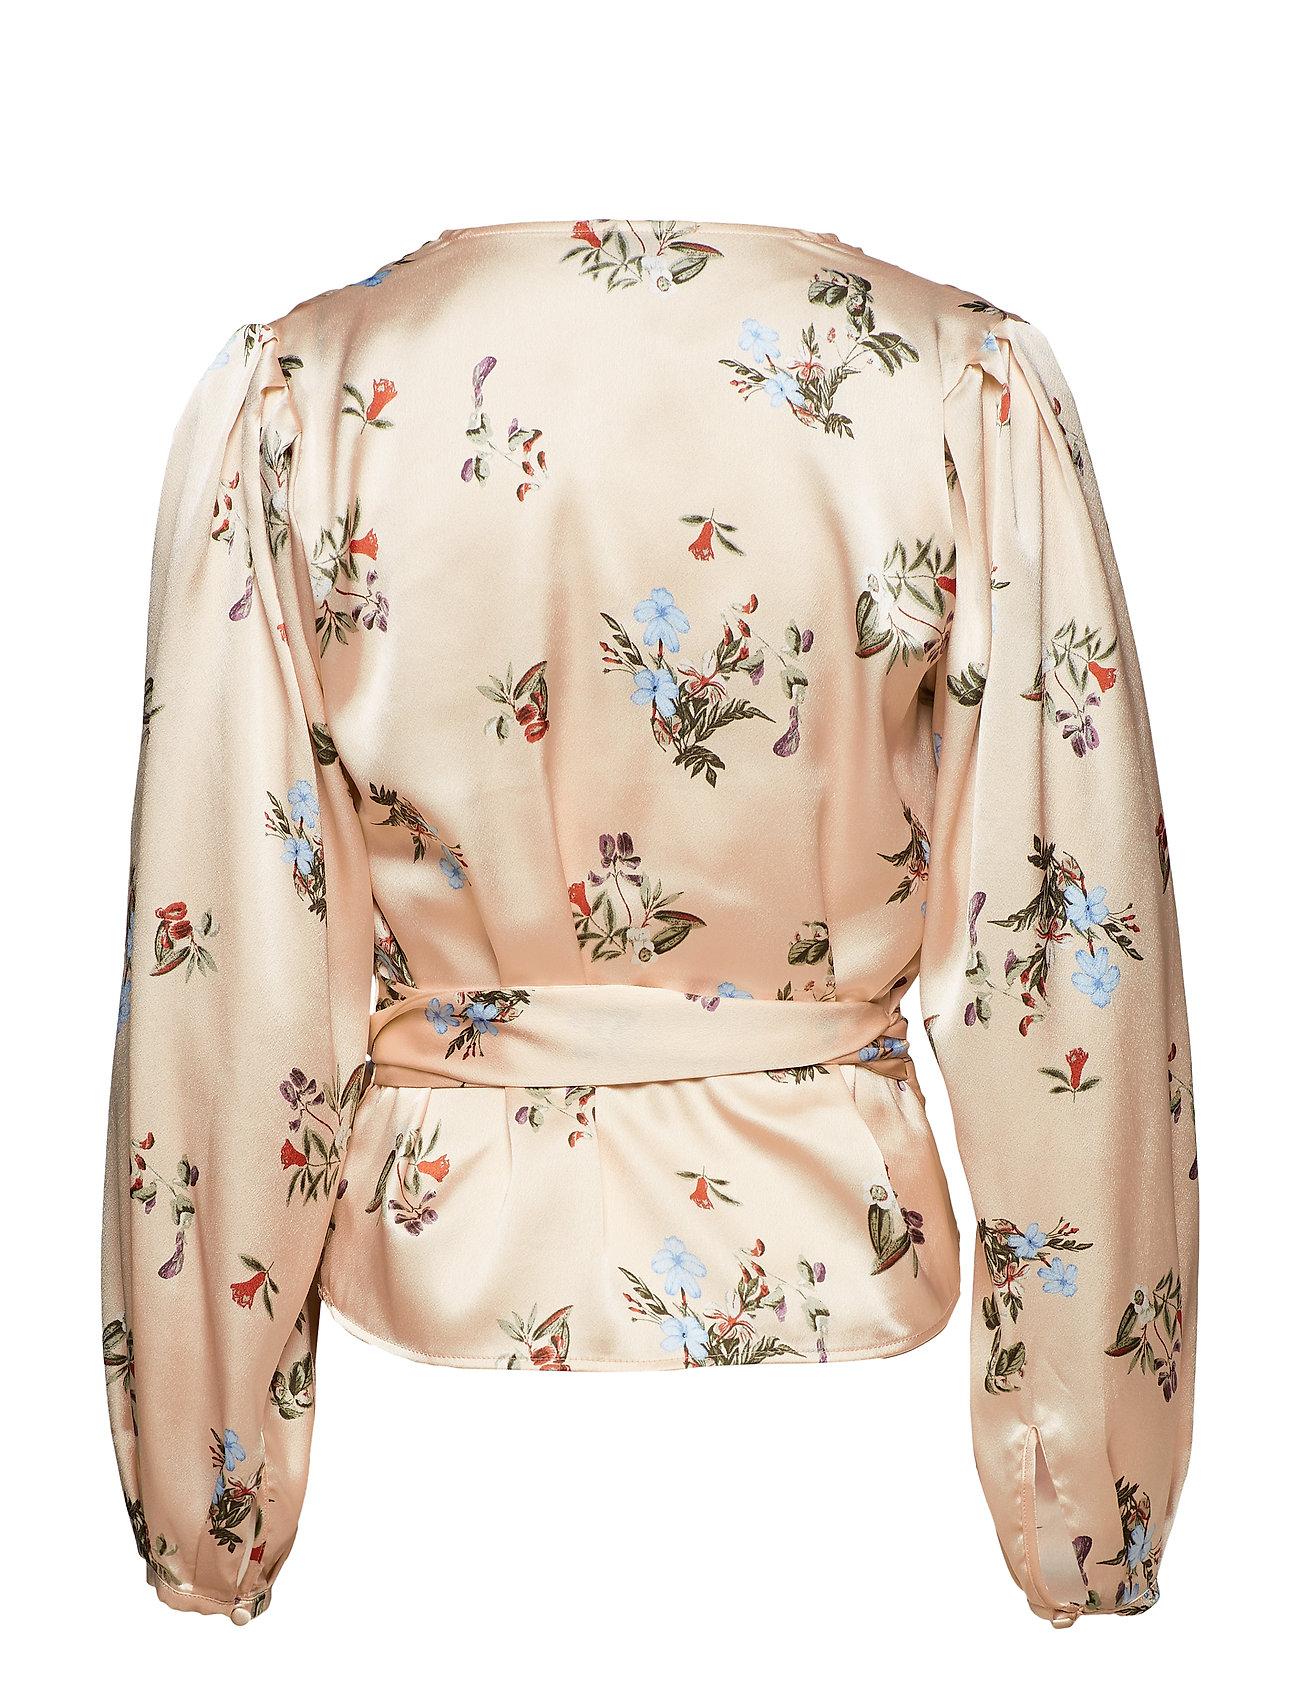 Twist & Tango    Valentina Blouse  - Blusen & Hemden    BLUSH FLOWER